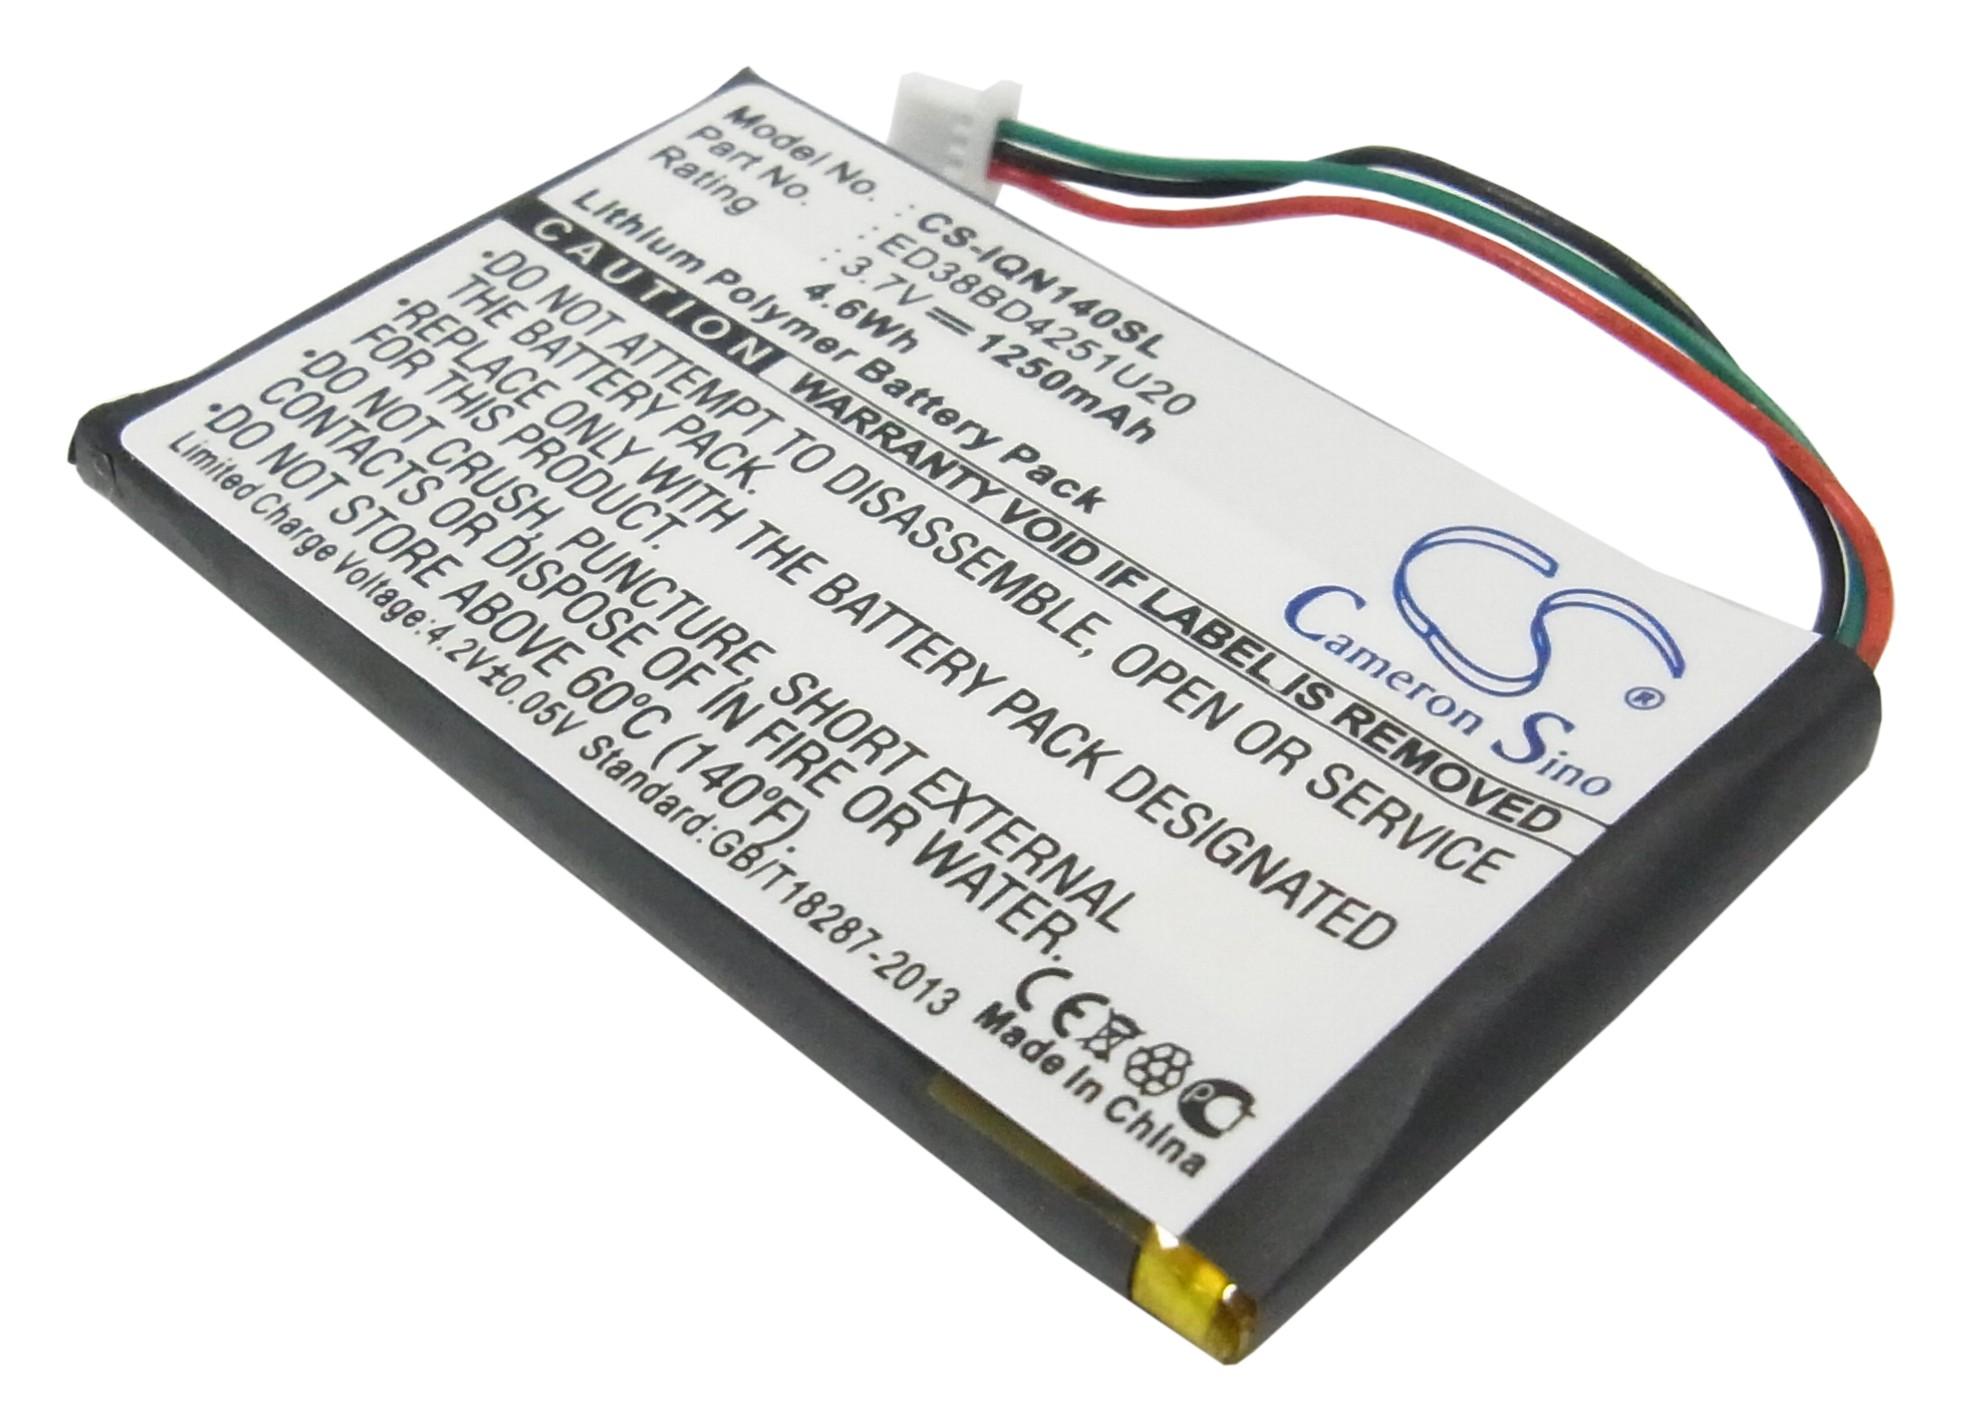 Cameron Sino baterie do navigací (gps) pro GARMIN Nuvi 1450 3.7V Li-Polymer 1250mAh černá - neoriginální